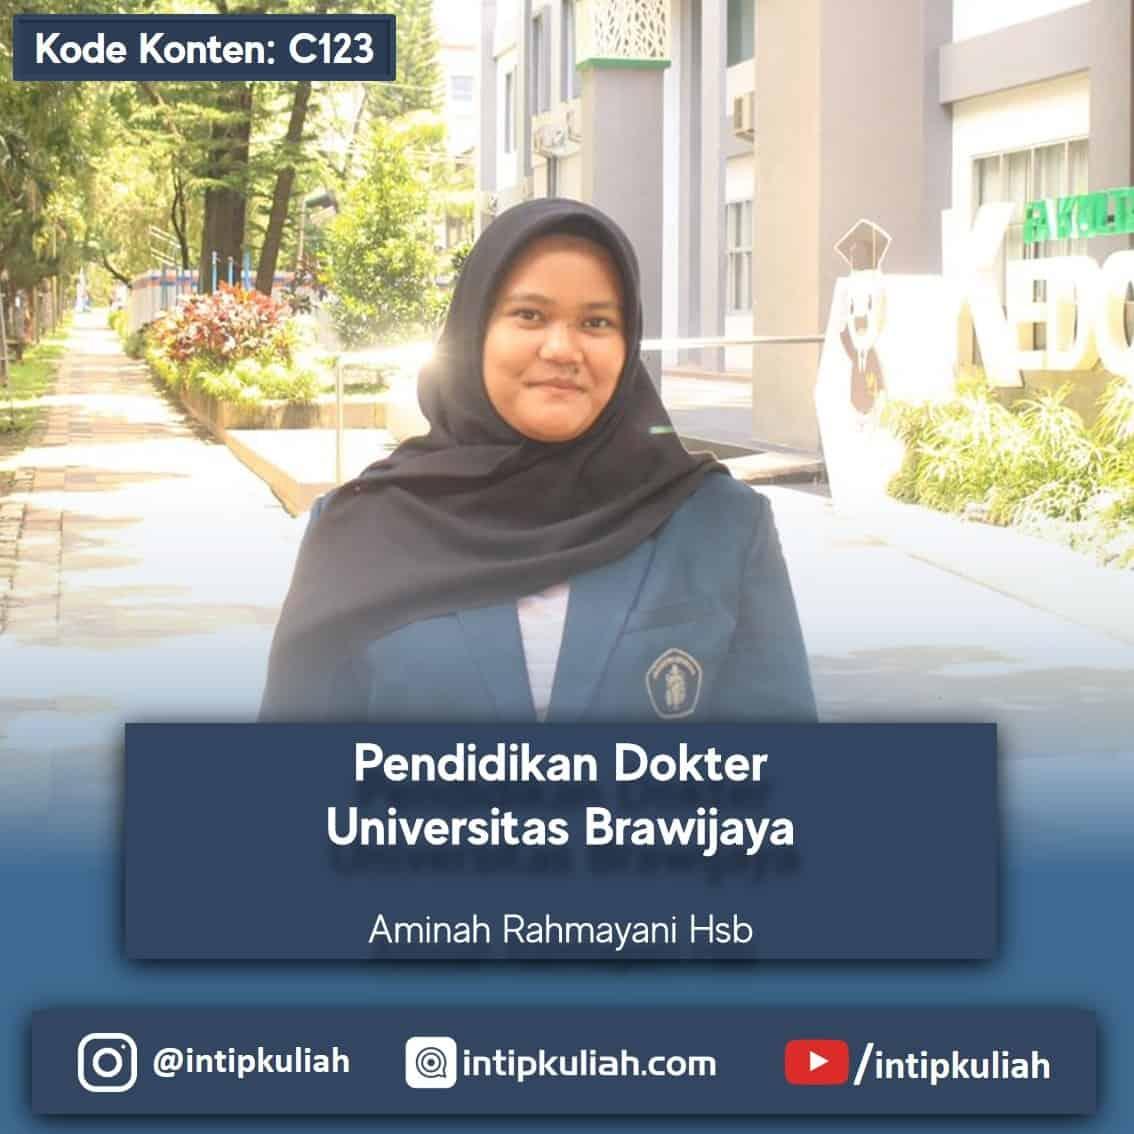 Kedokteran Universitas Brawijaya (Aminah)